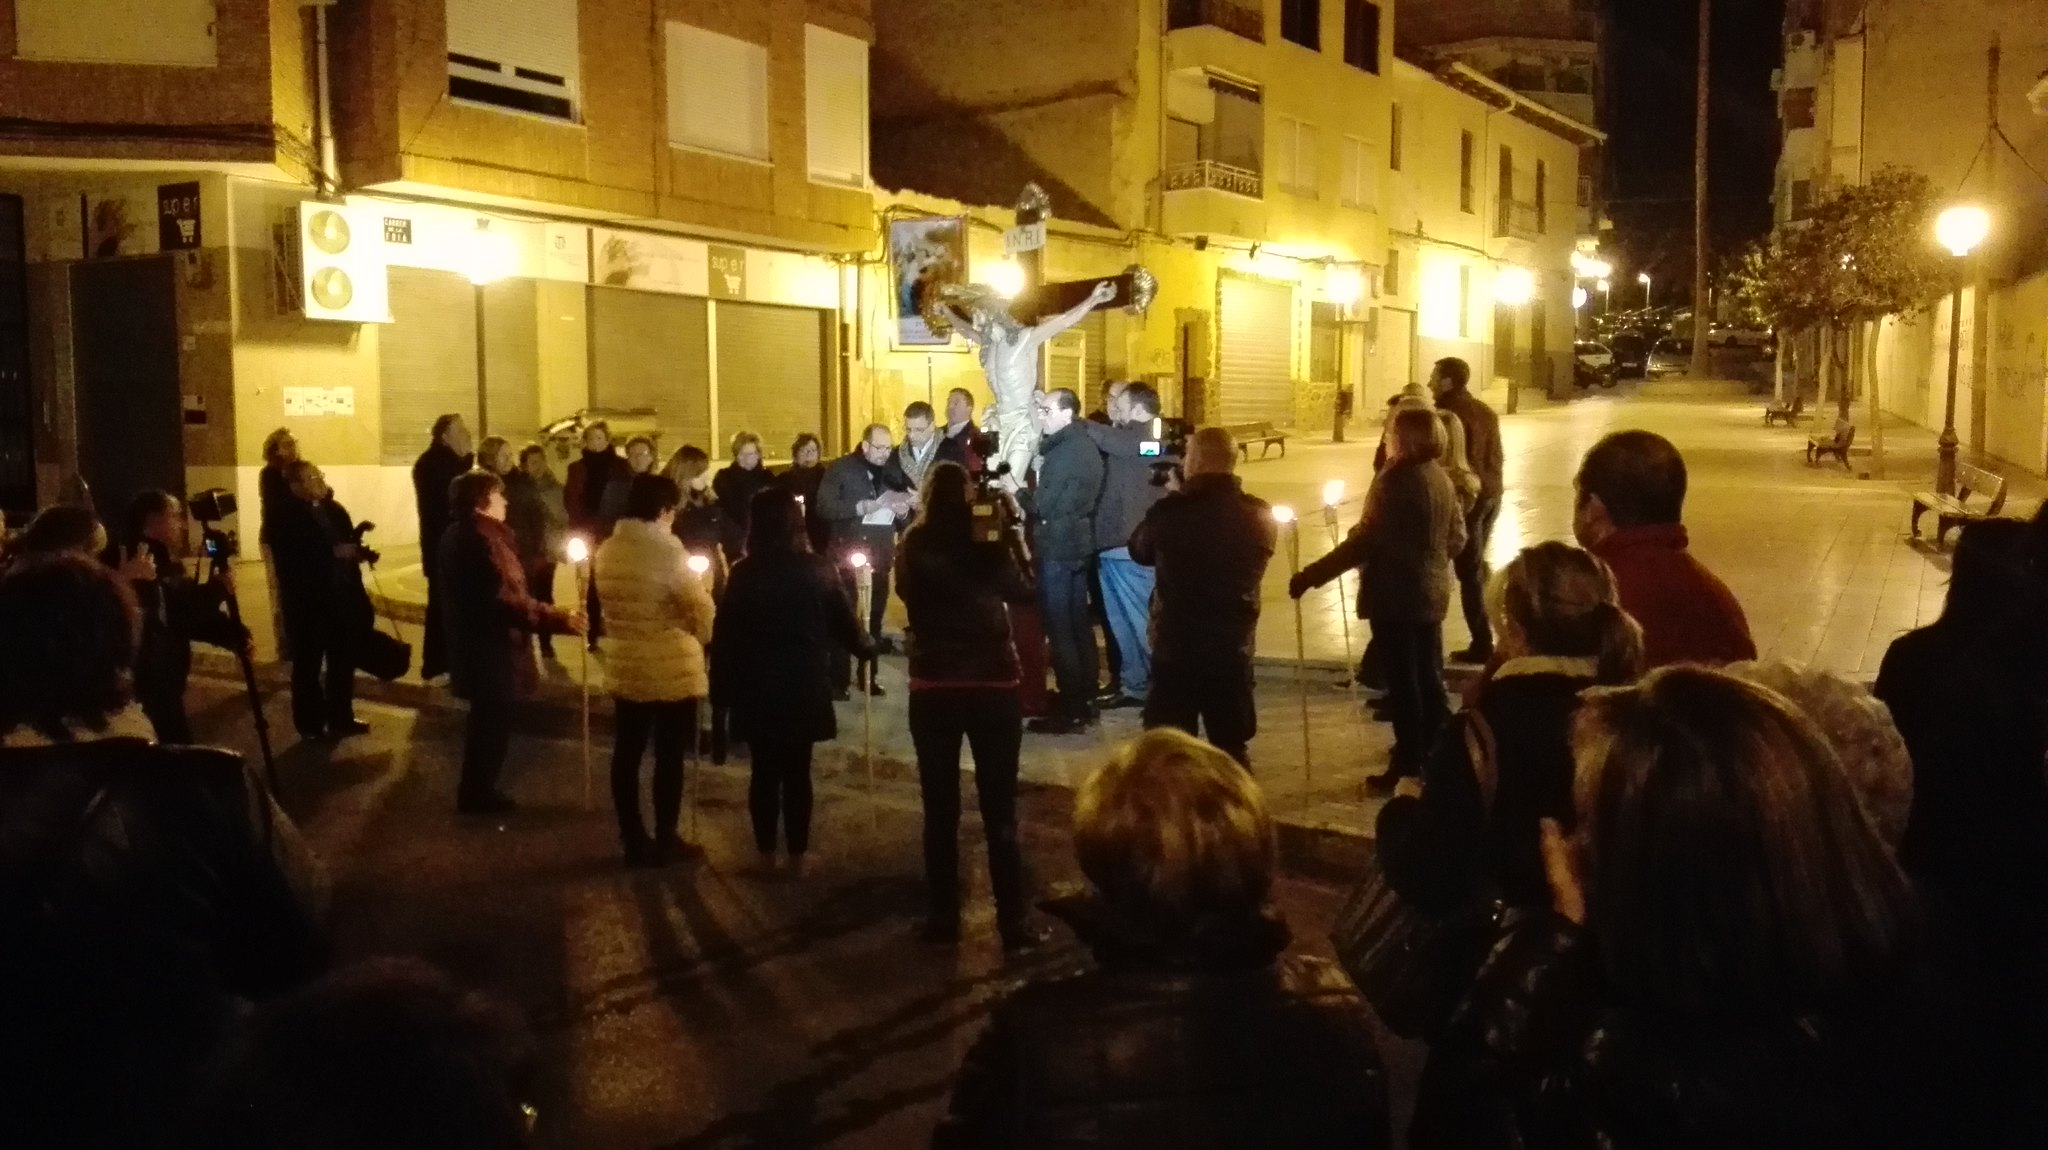 (2016-03-18) - VII Vía Crucis nocturno - Javier Romero Ripoll (003)